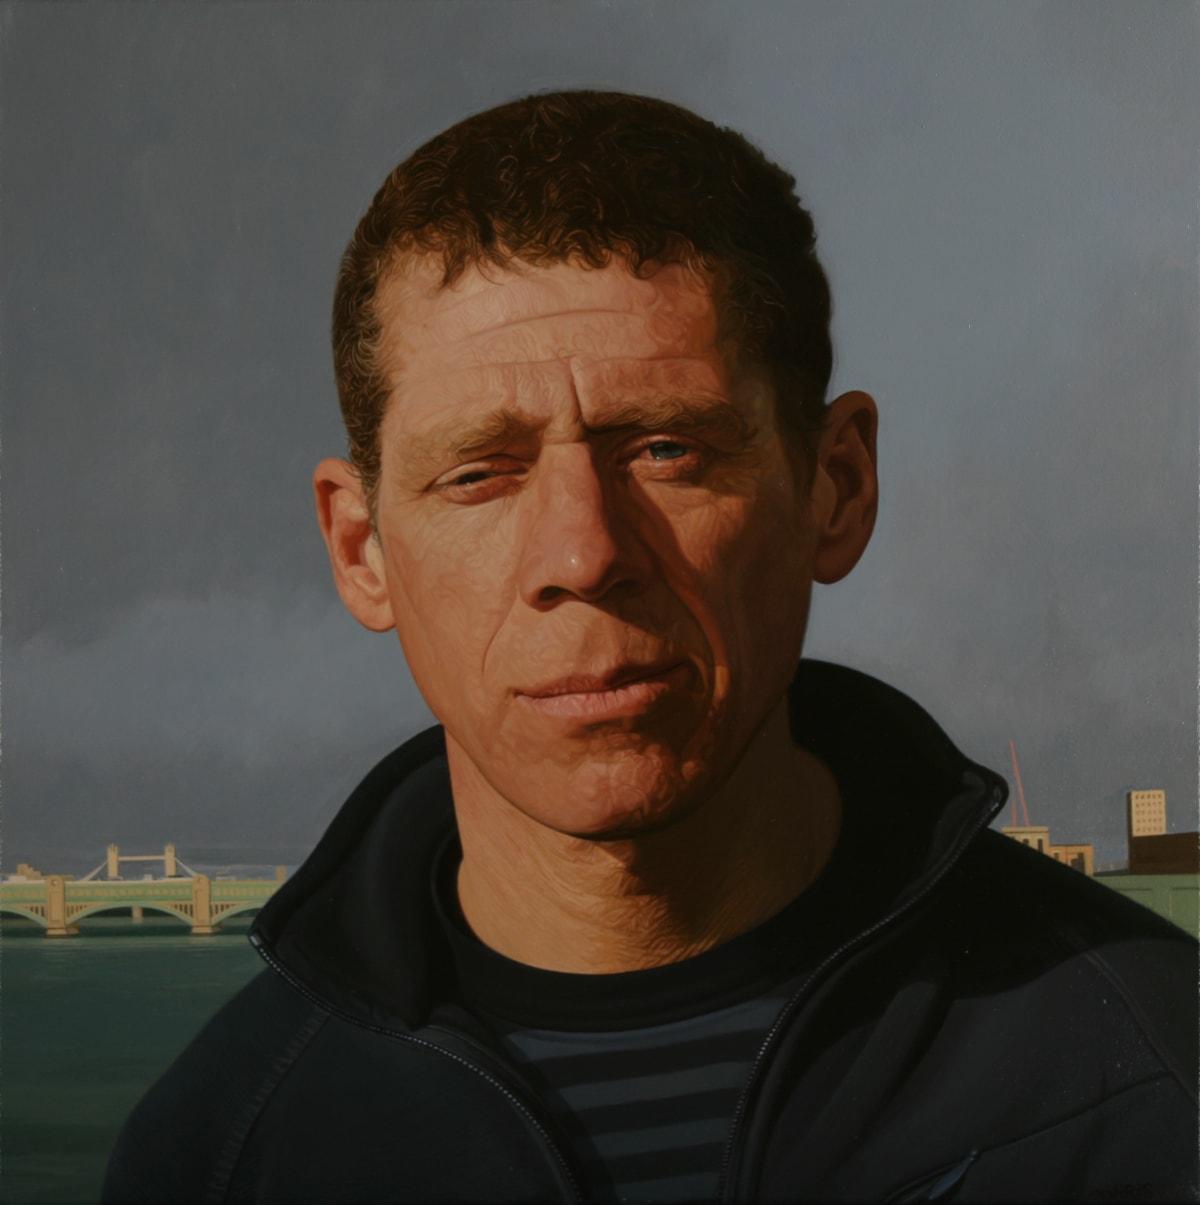 Philip Harris S.H in London oil on linen 30.5 x 30.5 cm